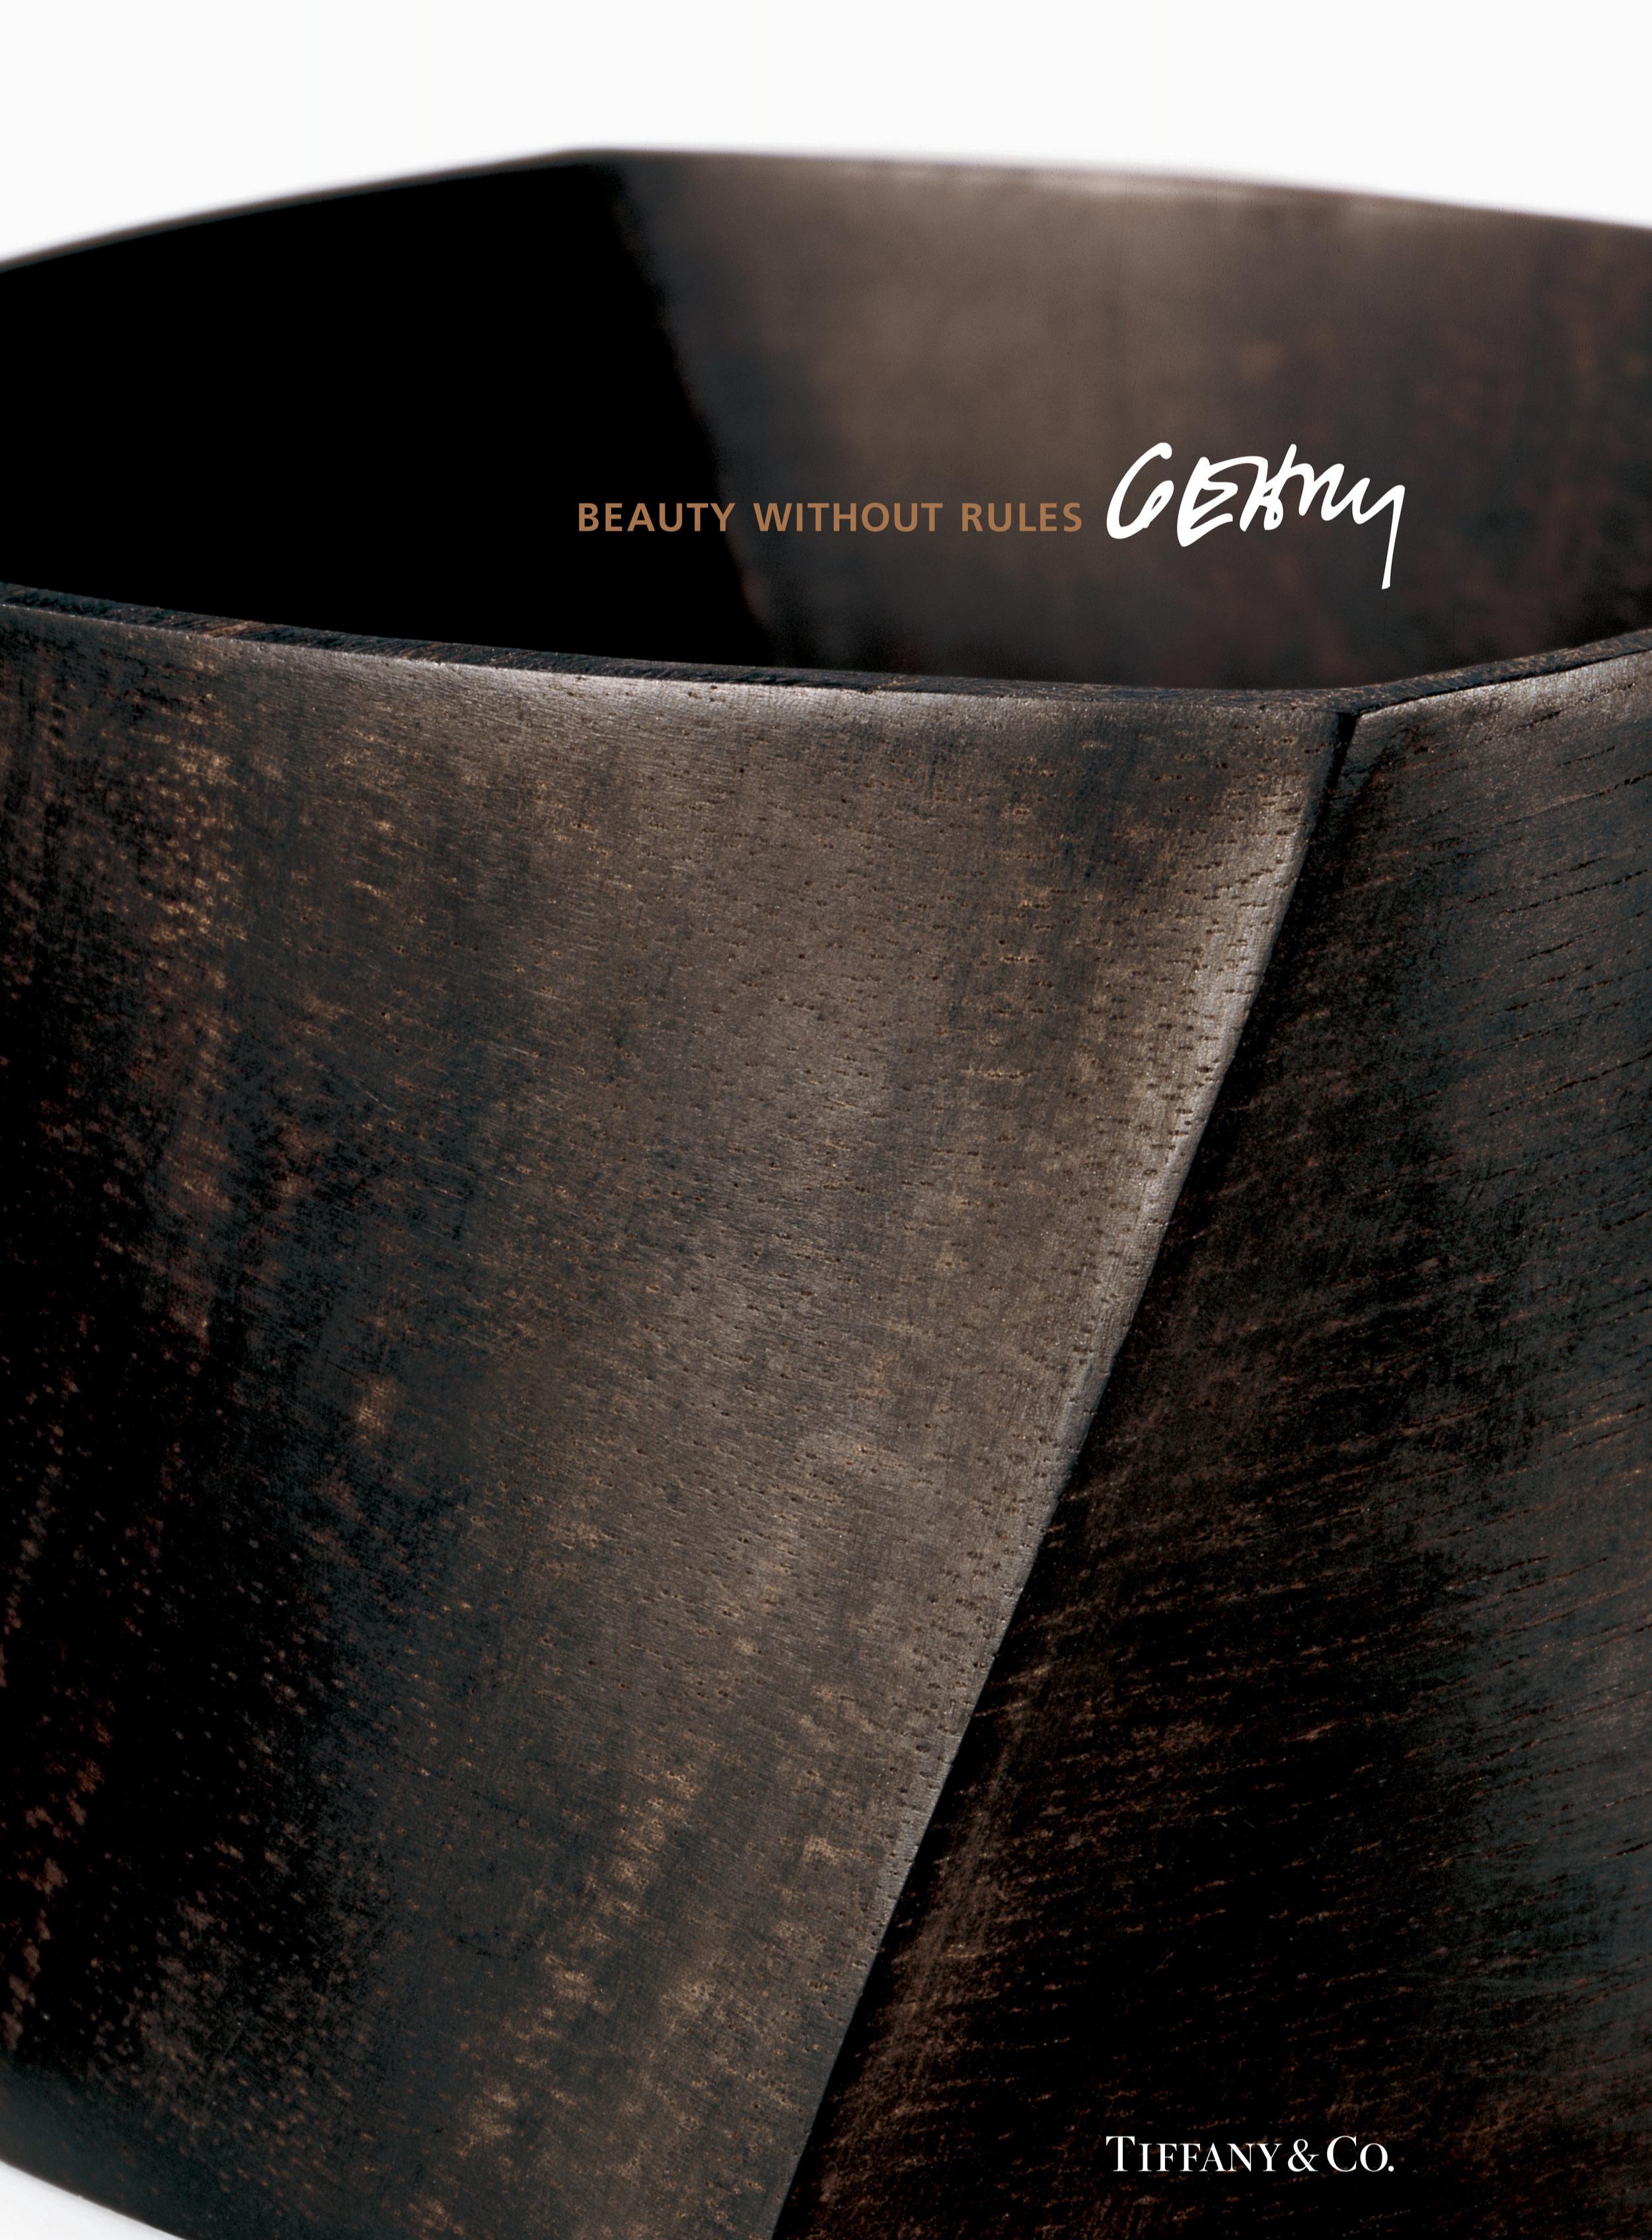 Frank+Gehry+Mailer-US+20001.jpg